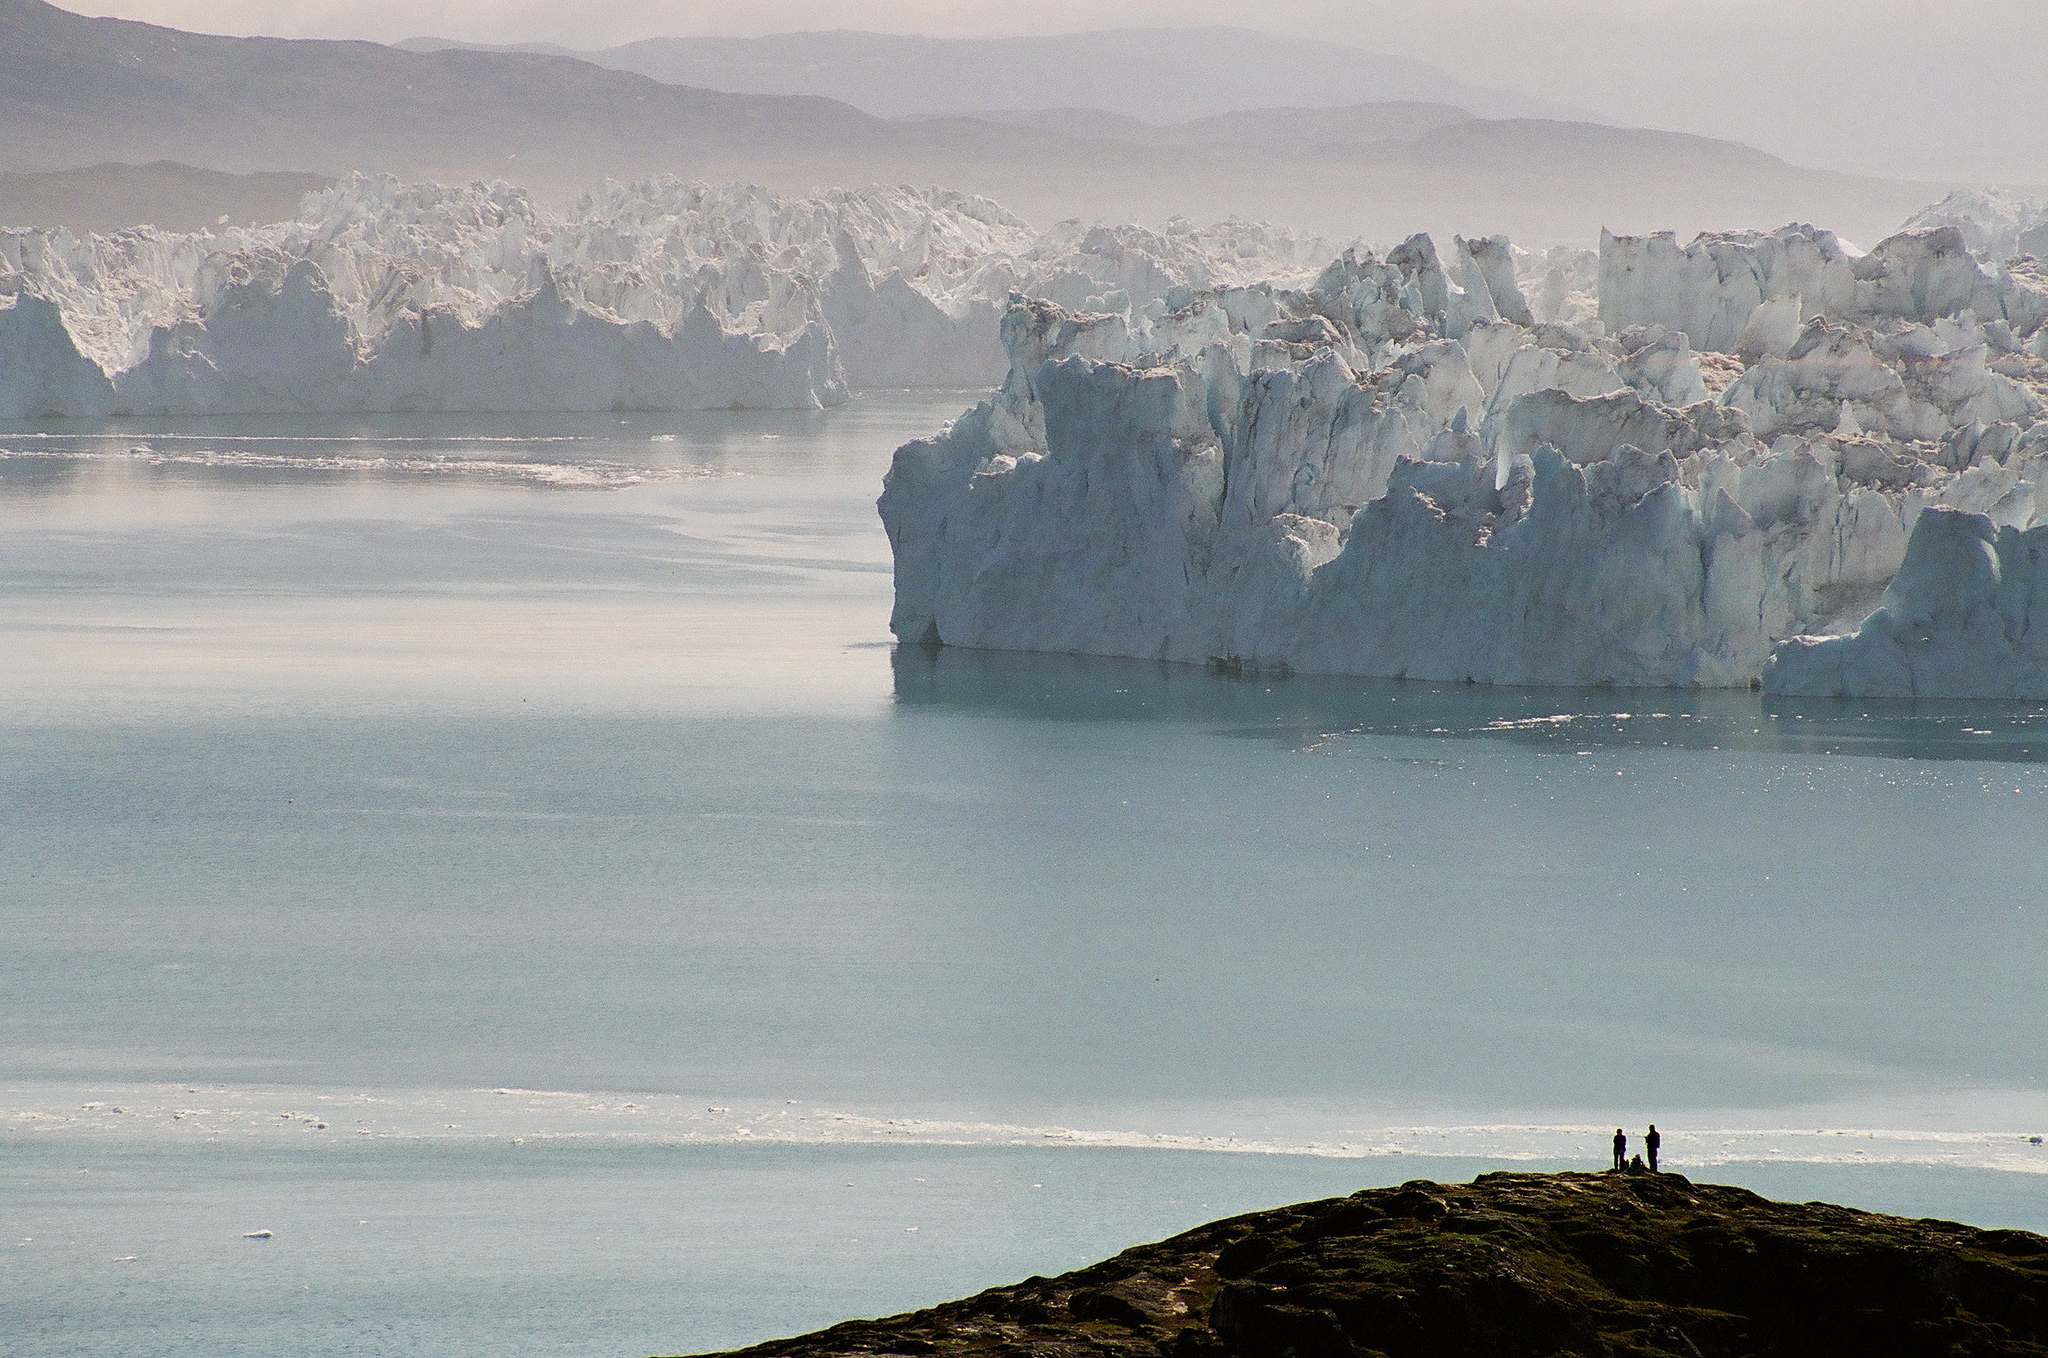 icefjord ilulissat9 The icefjord in Ilulissat, Greenland